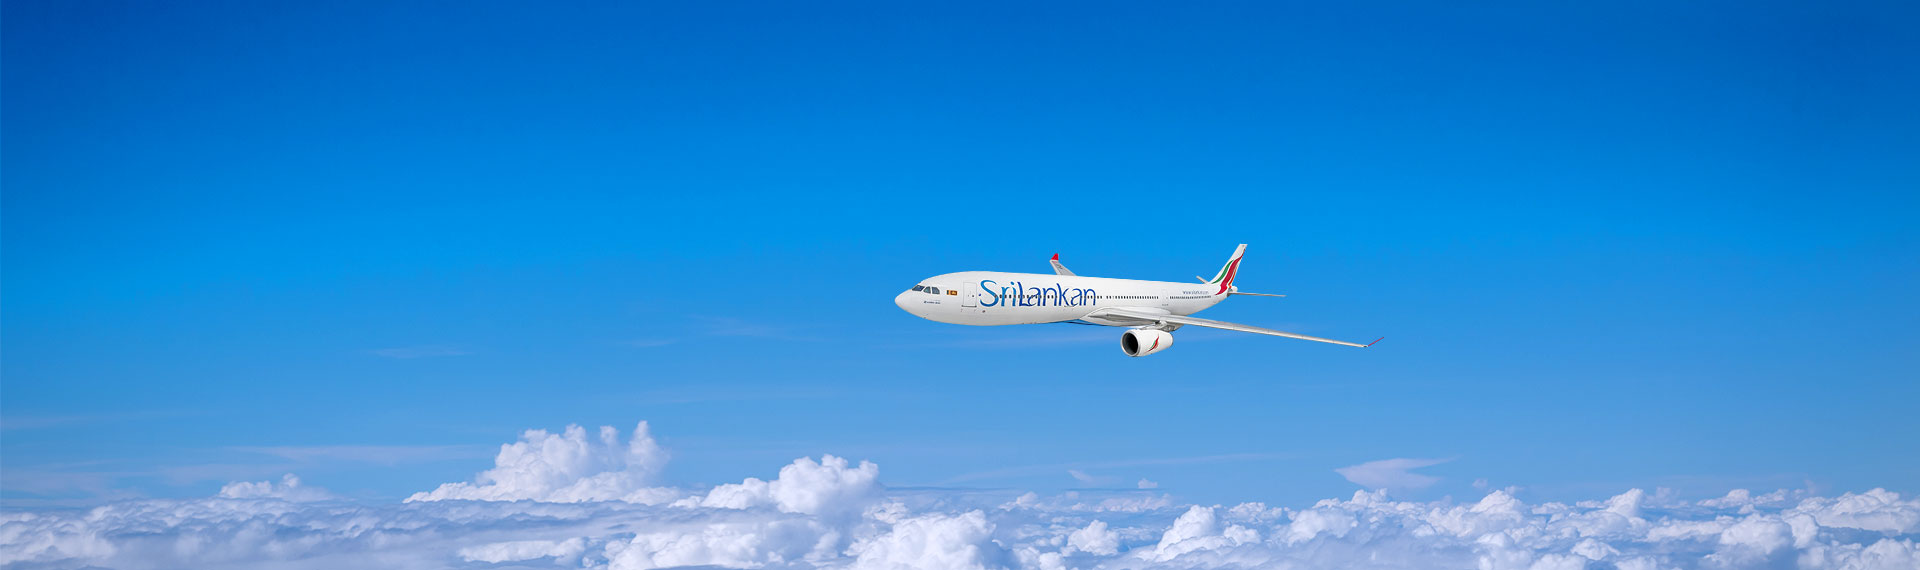 Srilankan Airlines Ul Reservations Amp Flight Deals